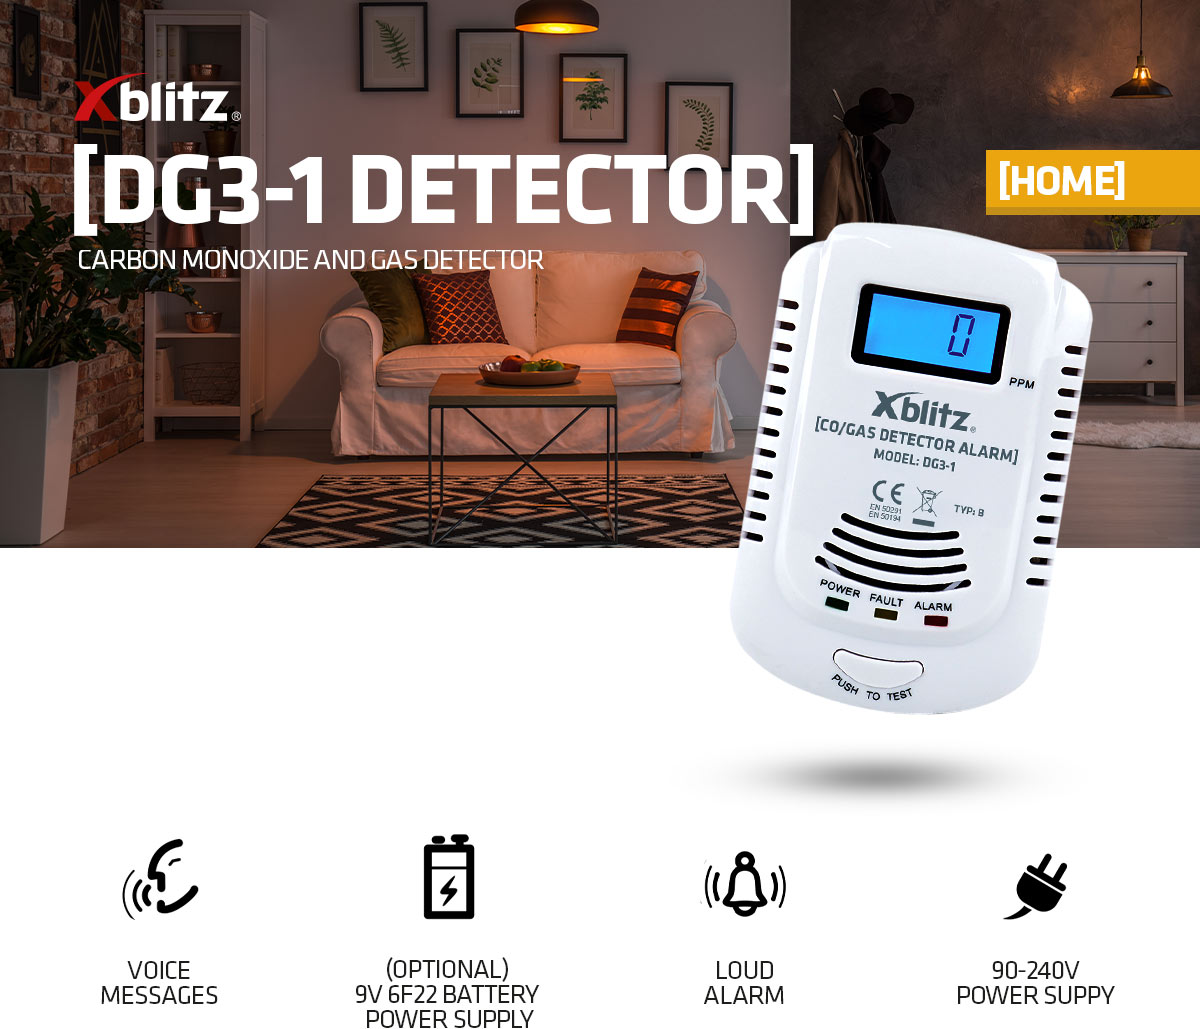 Xblitz DG3-1 carbon monoxide and flammable gas detector